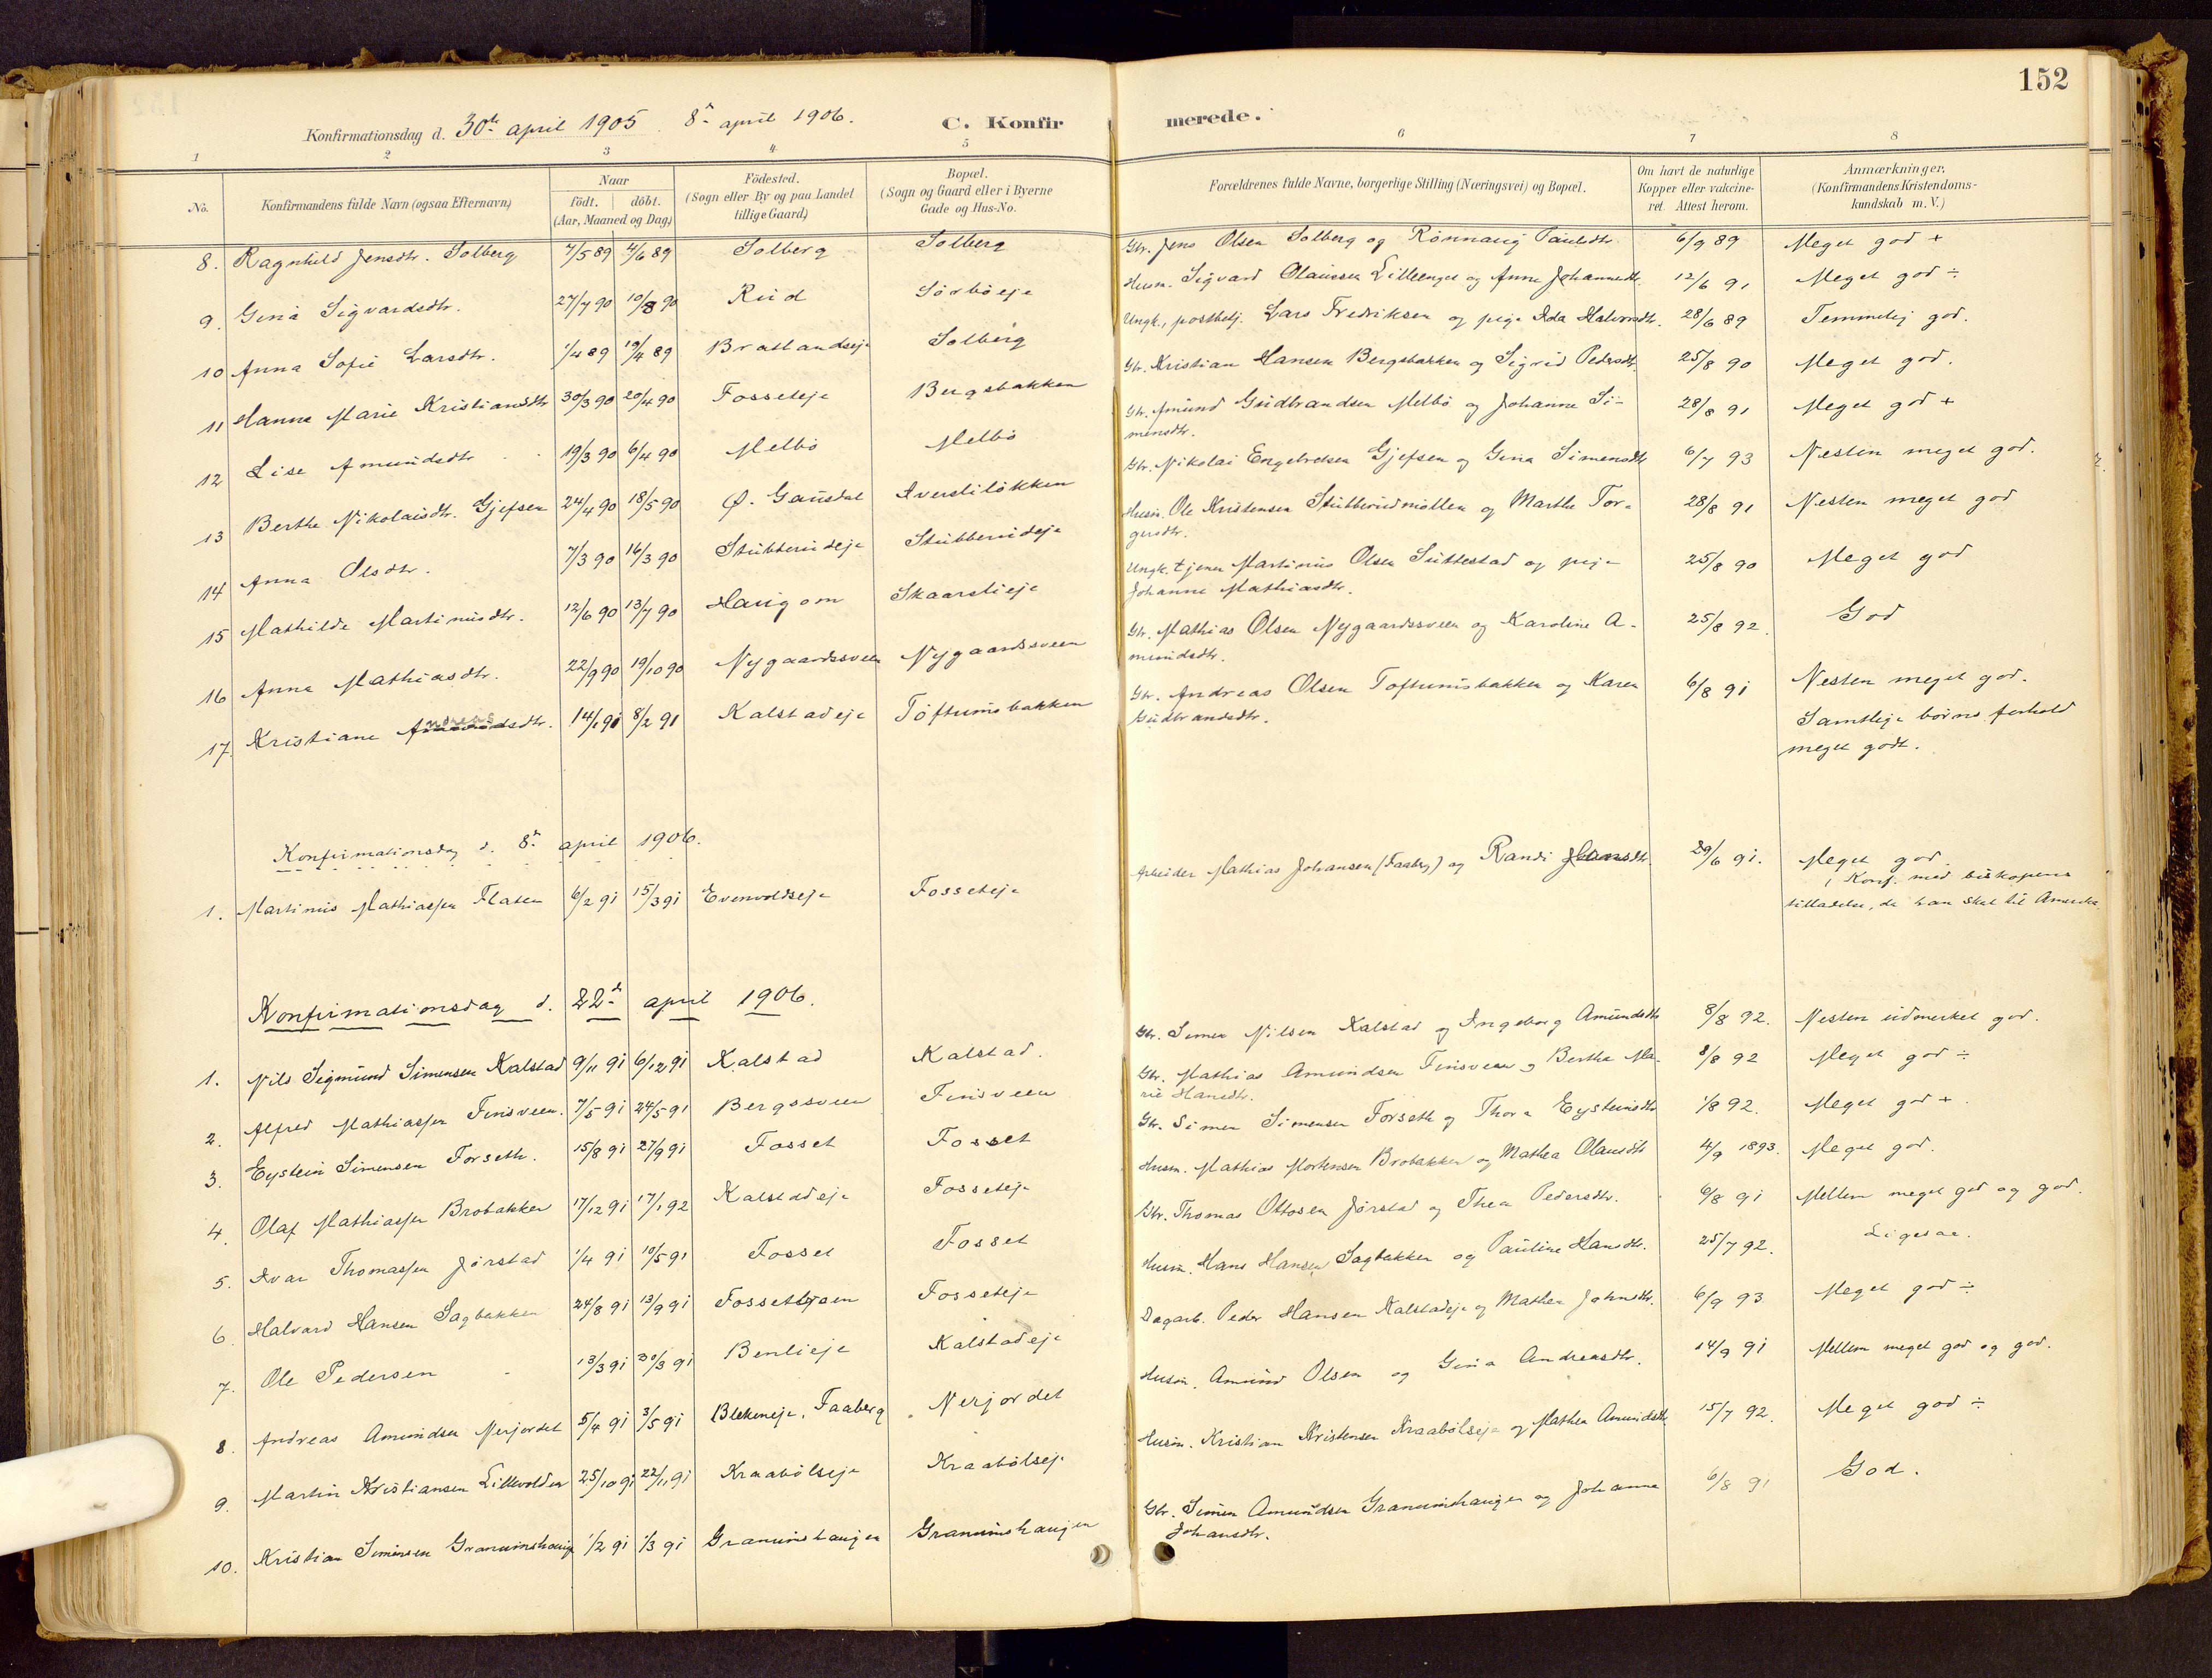 SAH, Vestre Gausdal prestekontor, Ministerialbok nr. 1, 1887-1914, s. 152